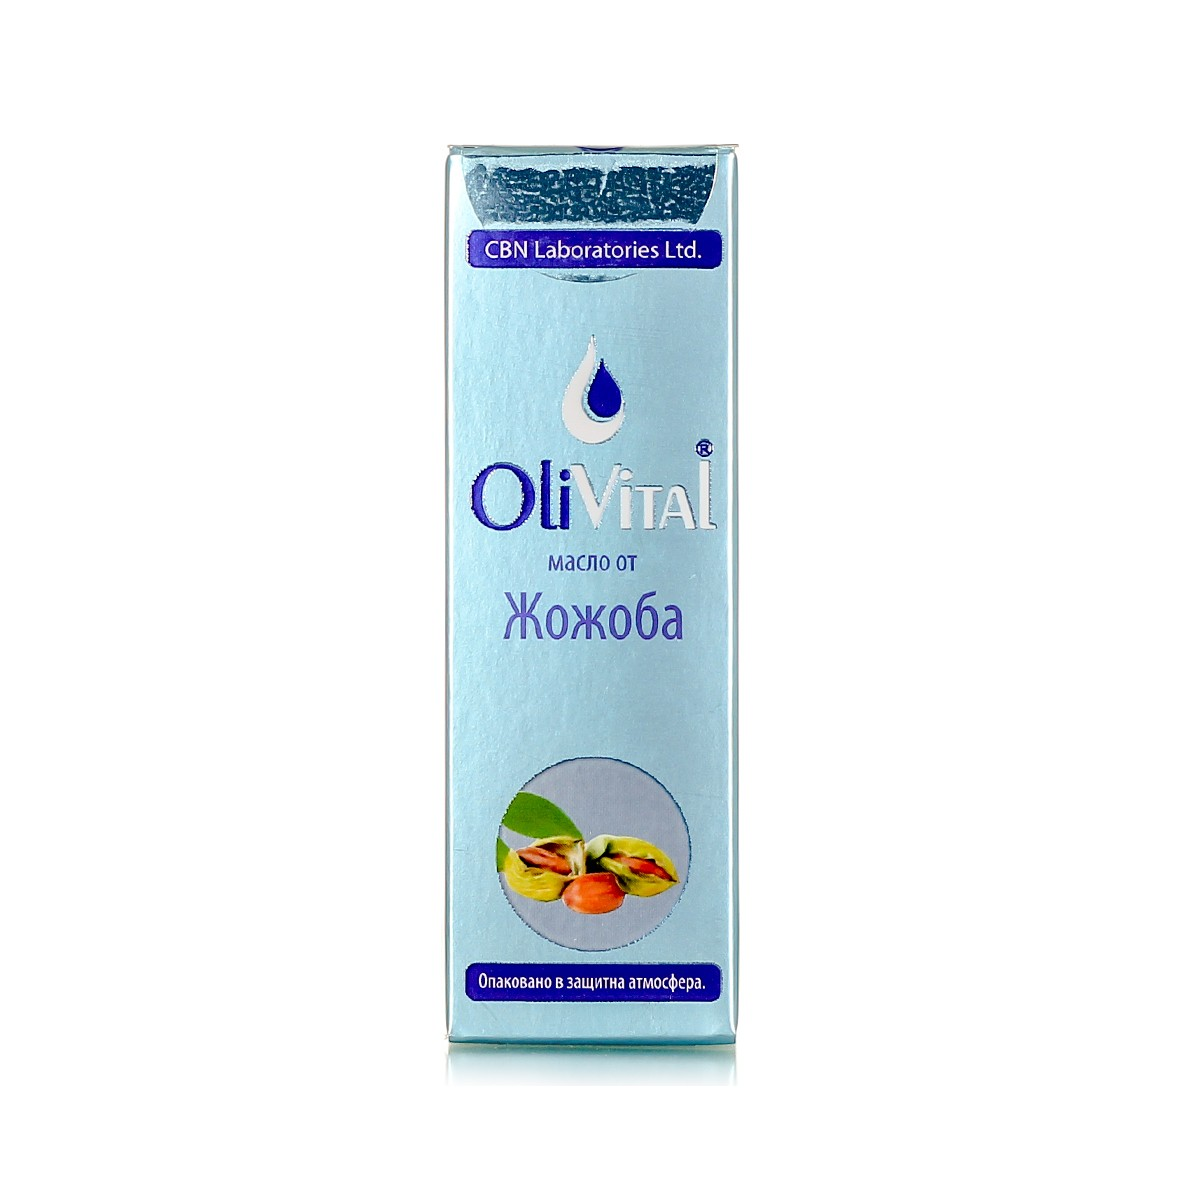 Natural jojoba oil OliVital CBN Laboratories